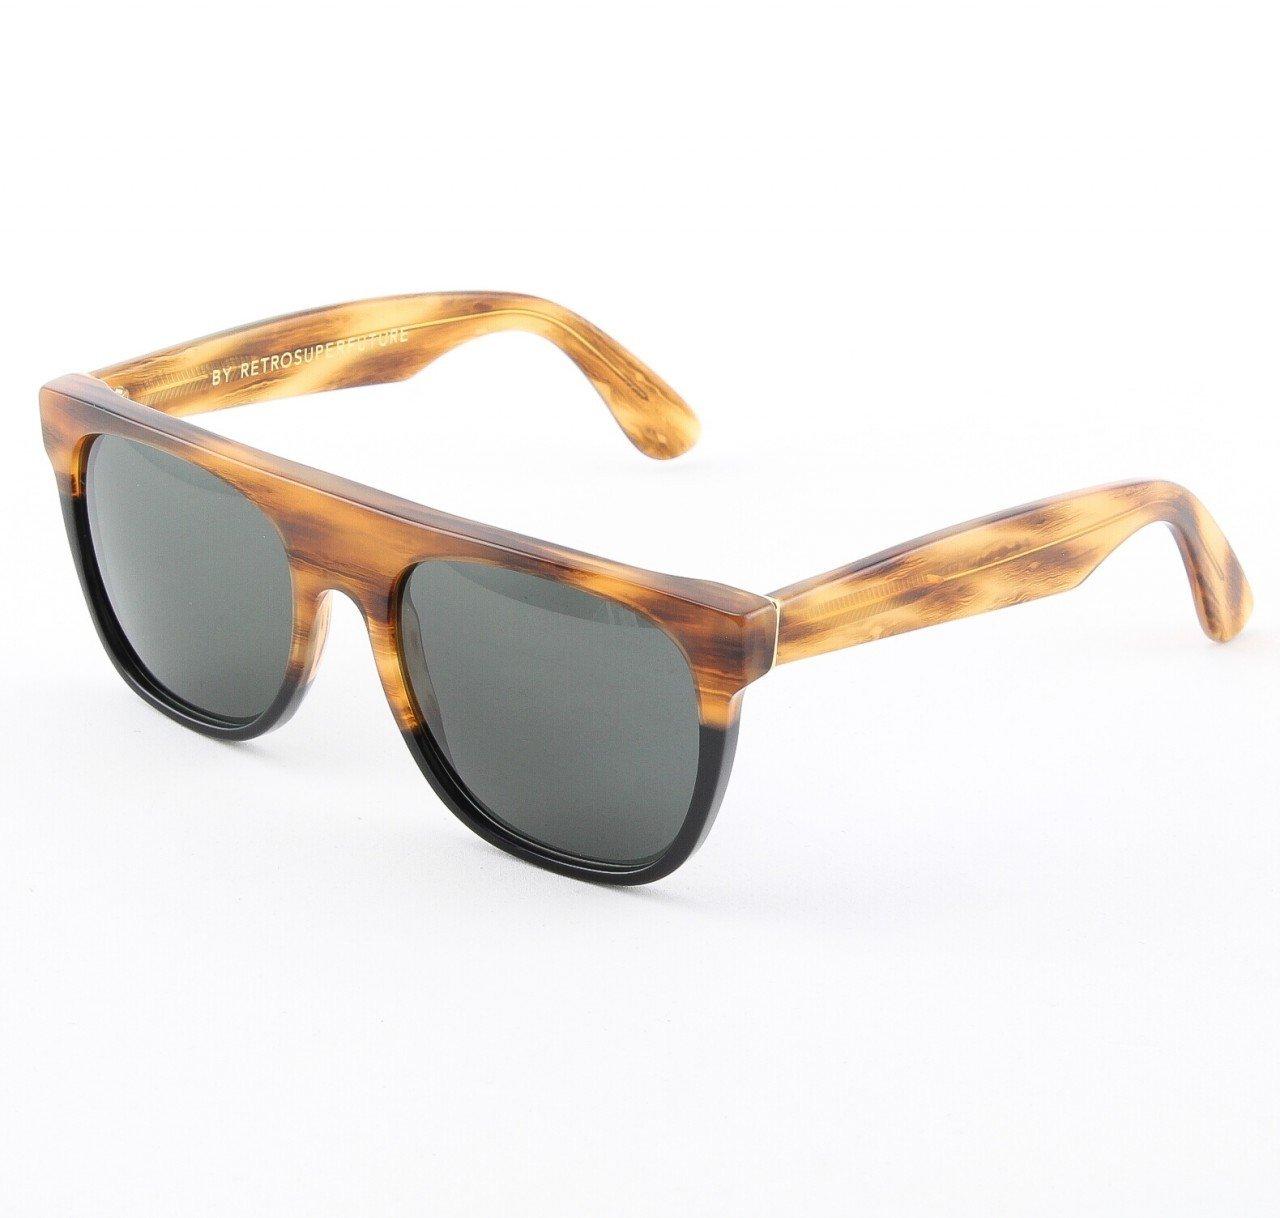 Super Flat Top 801/3T Sunglasses Color Brown Havana and Black by RETROSUPERFUTURE